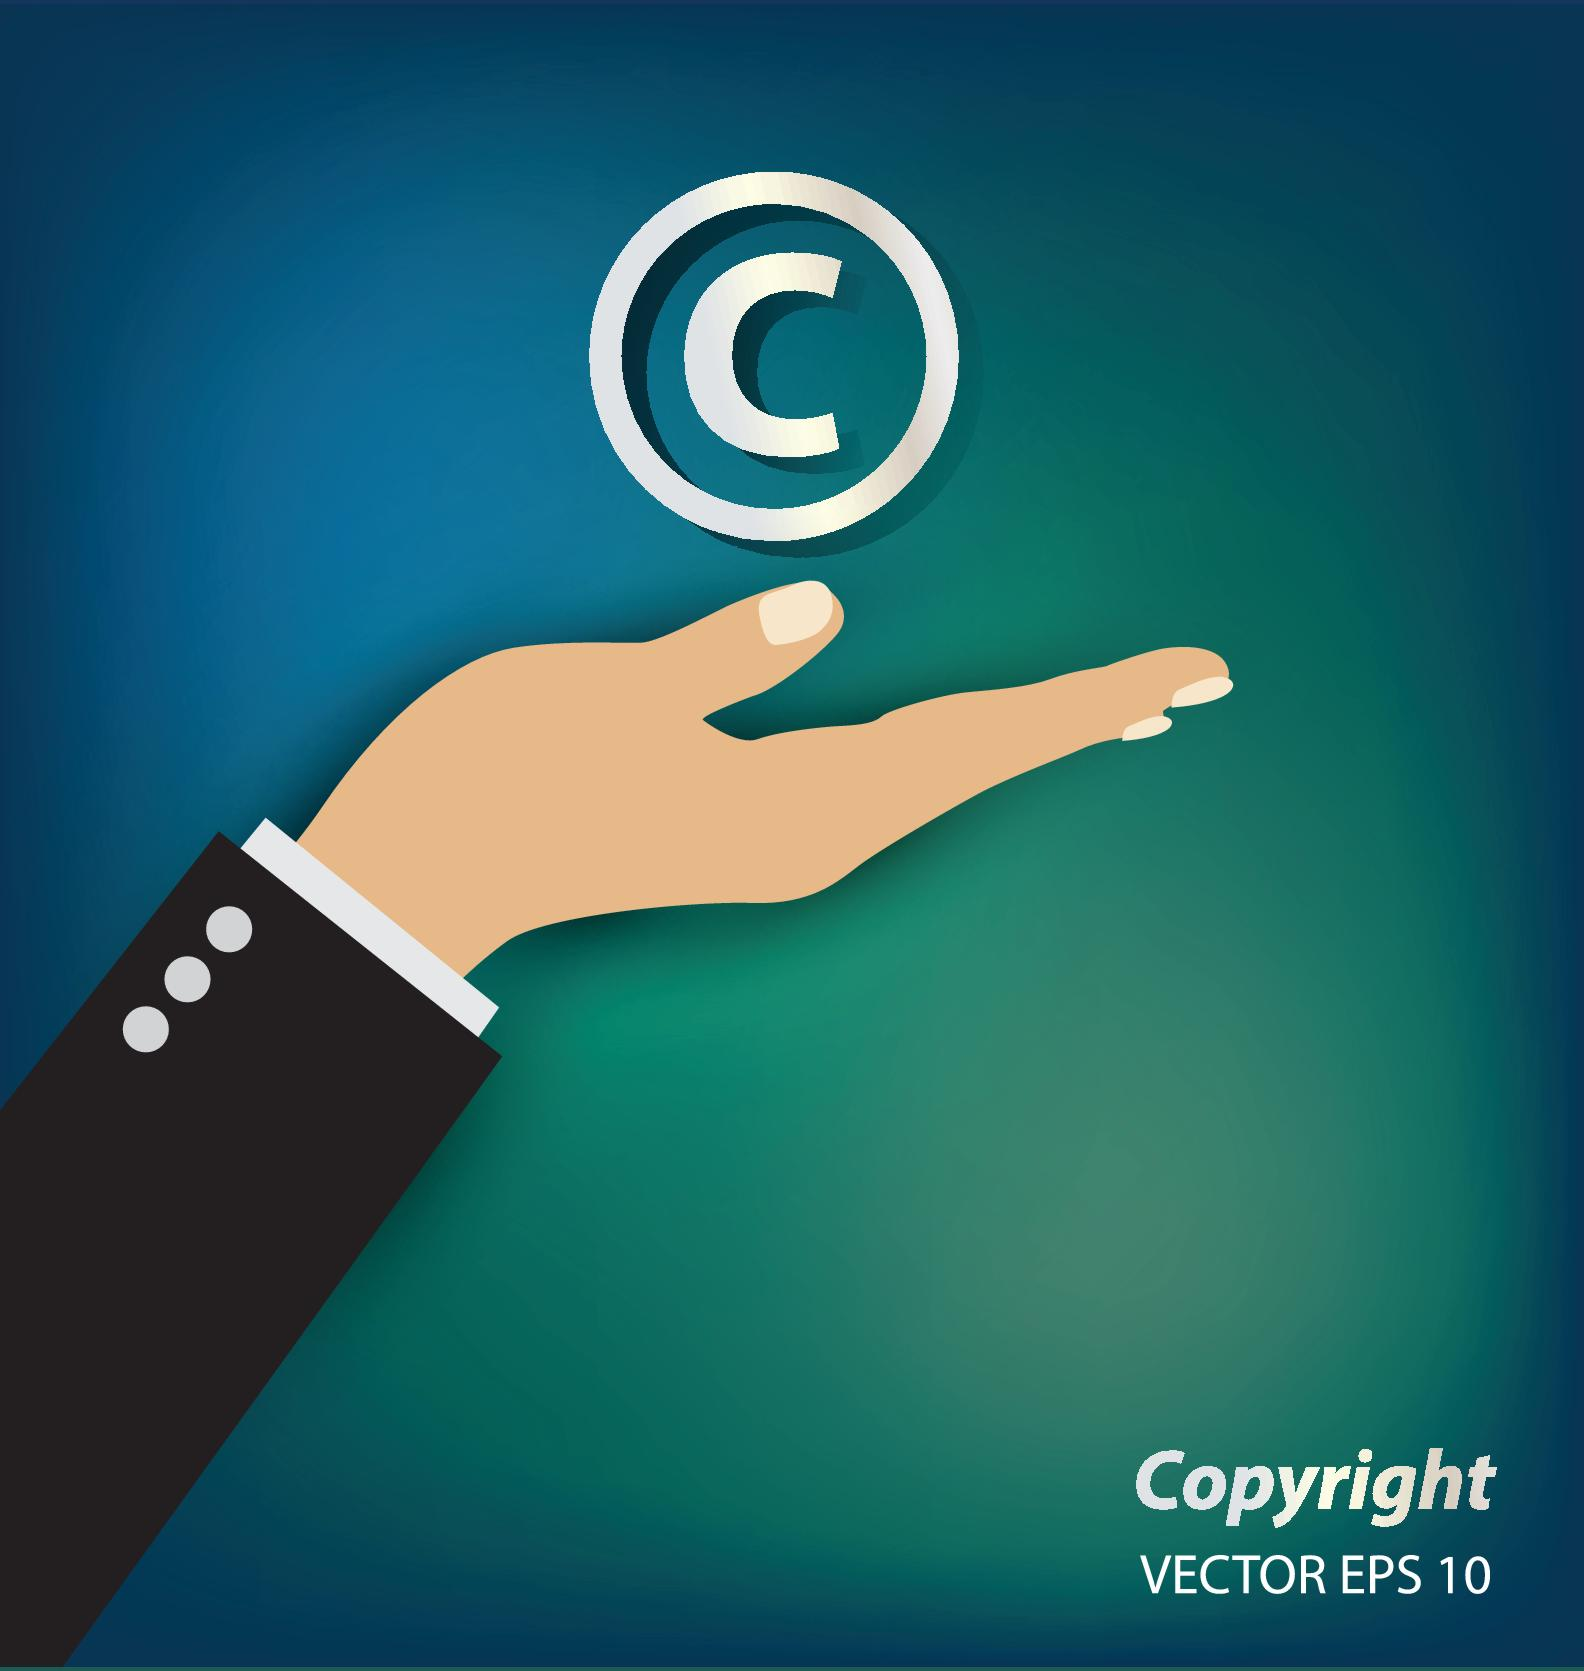 Creative copyright business vector design 01 creative copyright business